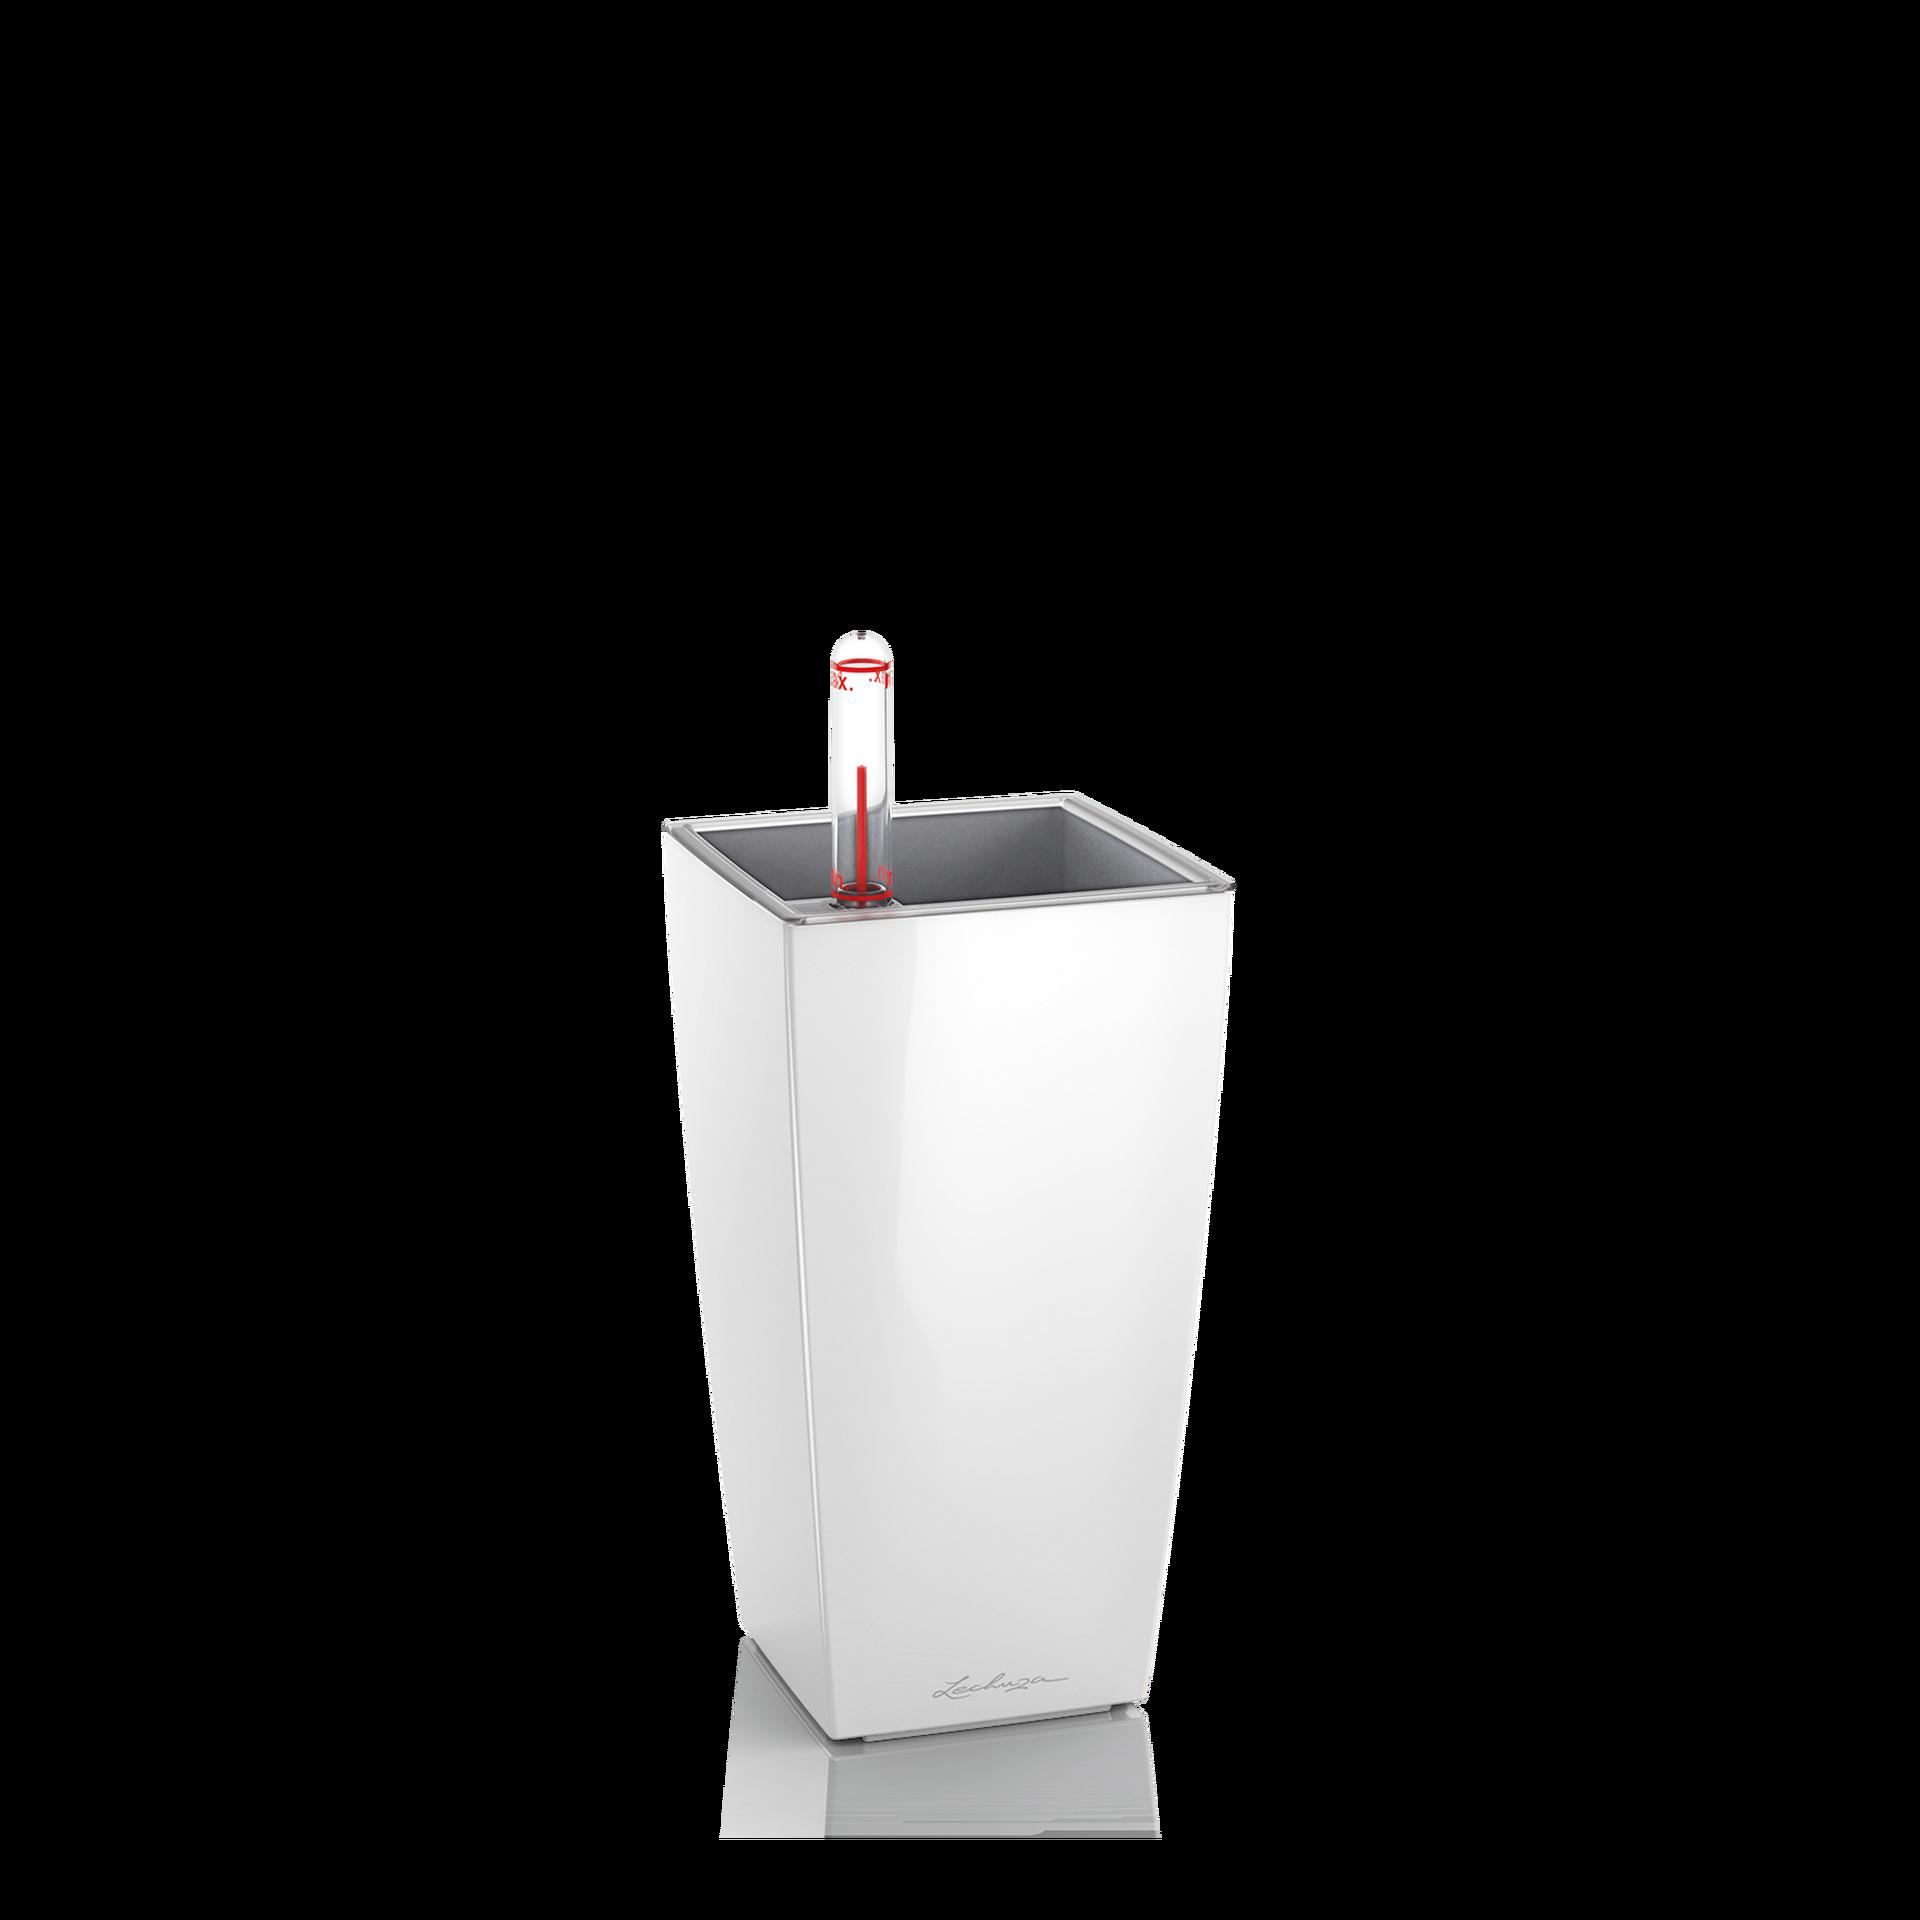 MINI-CUBI weiß hochglanz